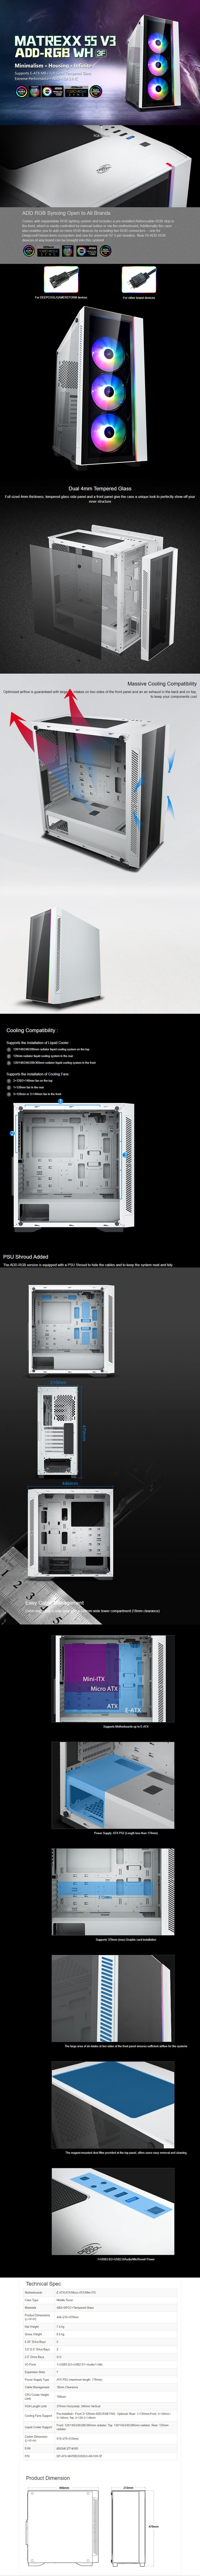 Deepcool Matrexx 55 V3 ADD-RGB 3F Mid-Tower E-ATX Case - White  - Overview 1